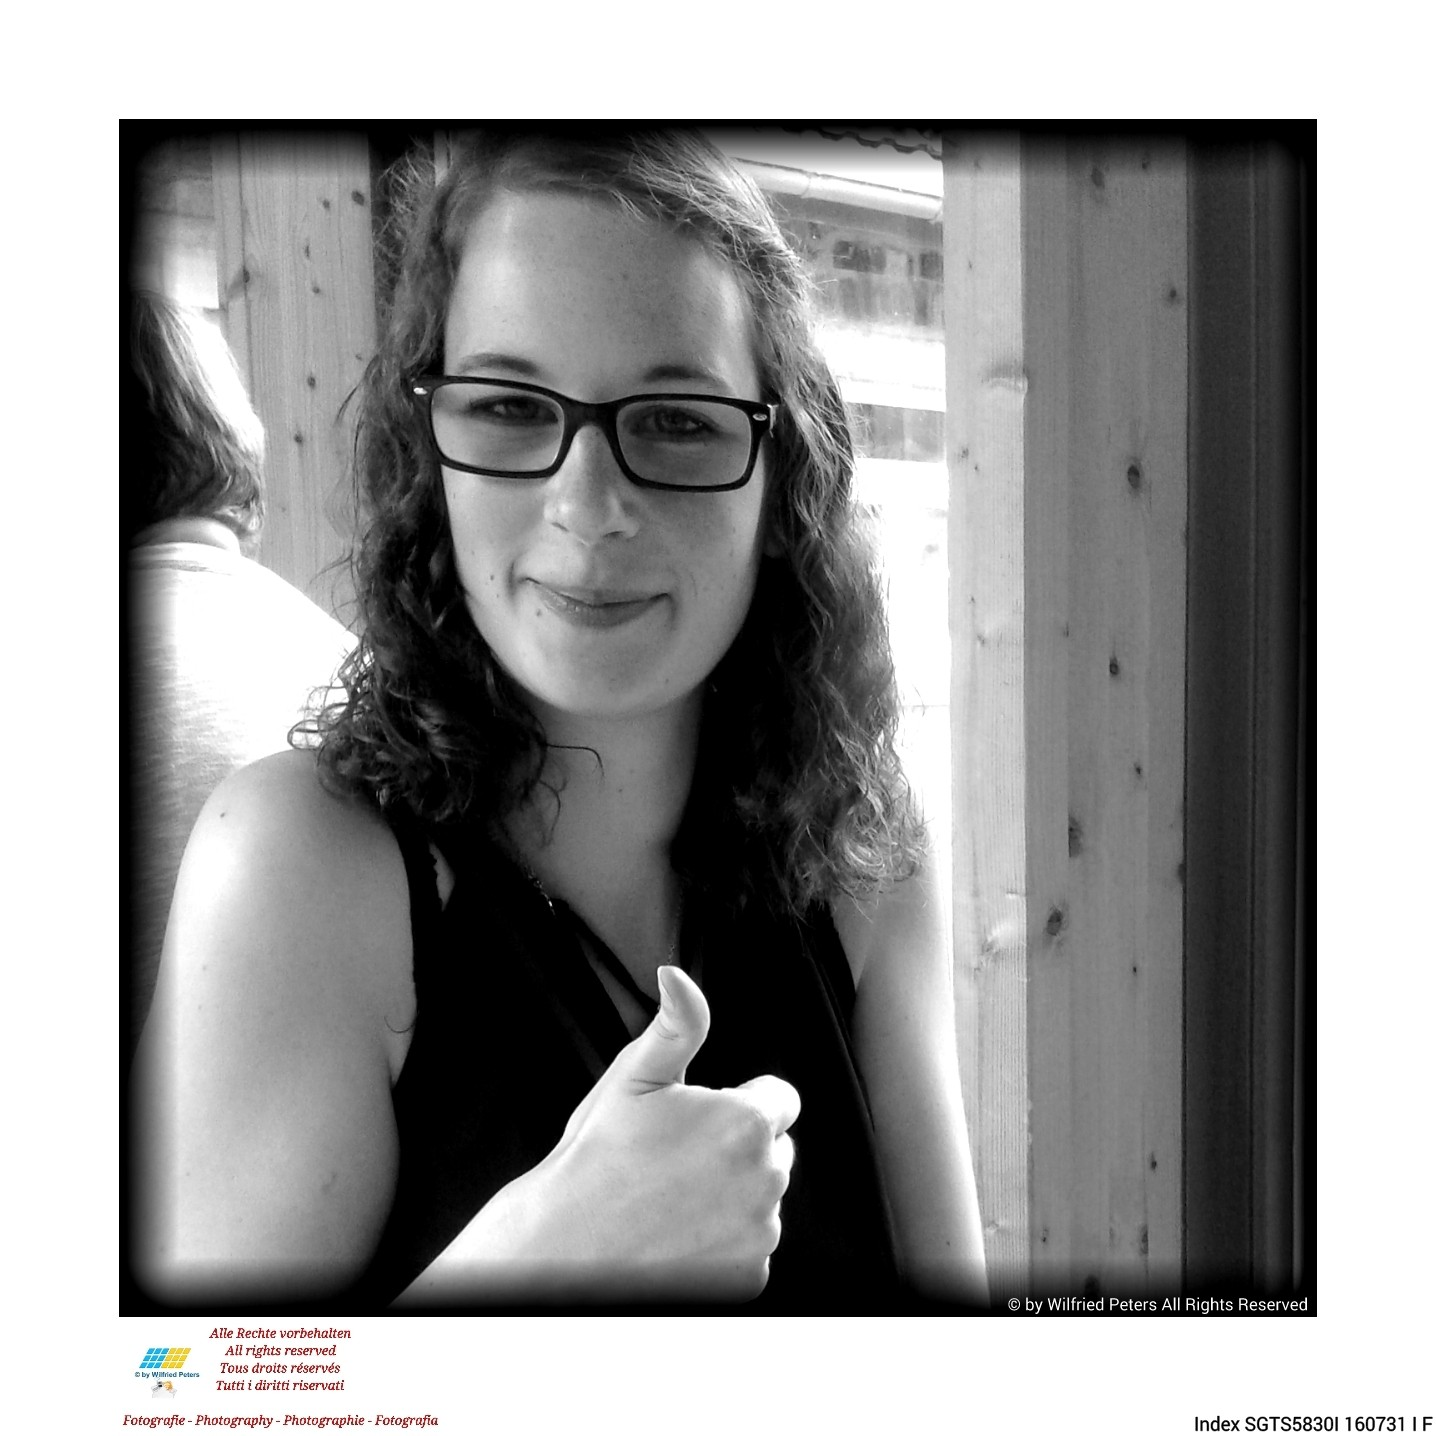 #Fotografie #Photography #Photographie #Fotografia #schwarzweiss #blackandwhite #noiretblanc #biancoenero #camïeu #monochromatic #Lächeln #Smile #Sourire #Sorriso 31.7.2016